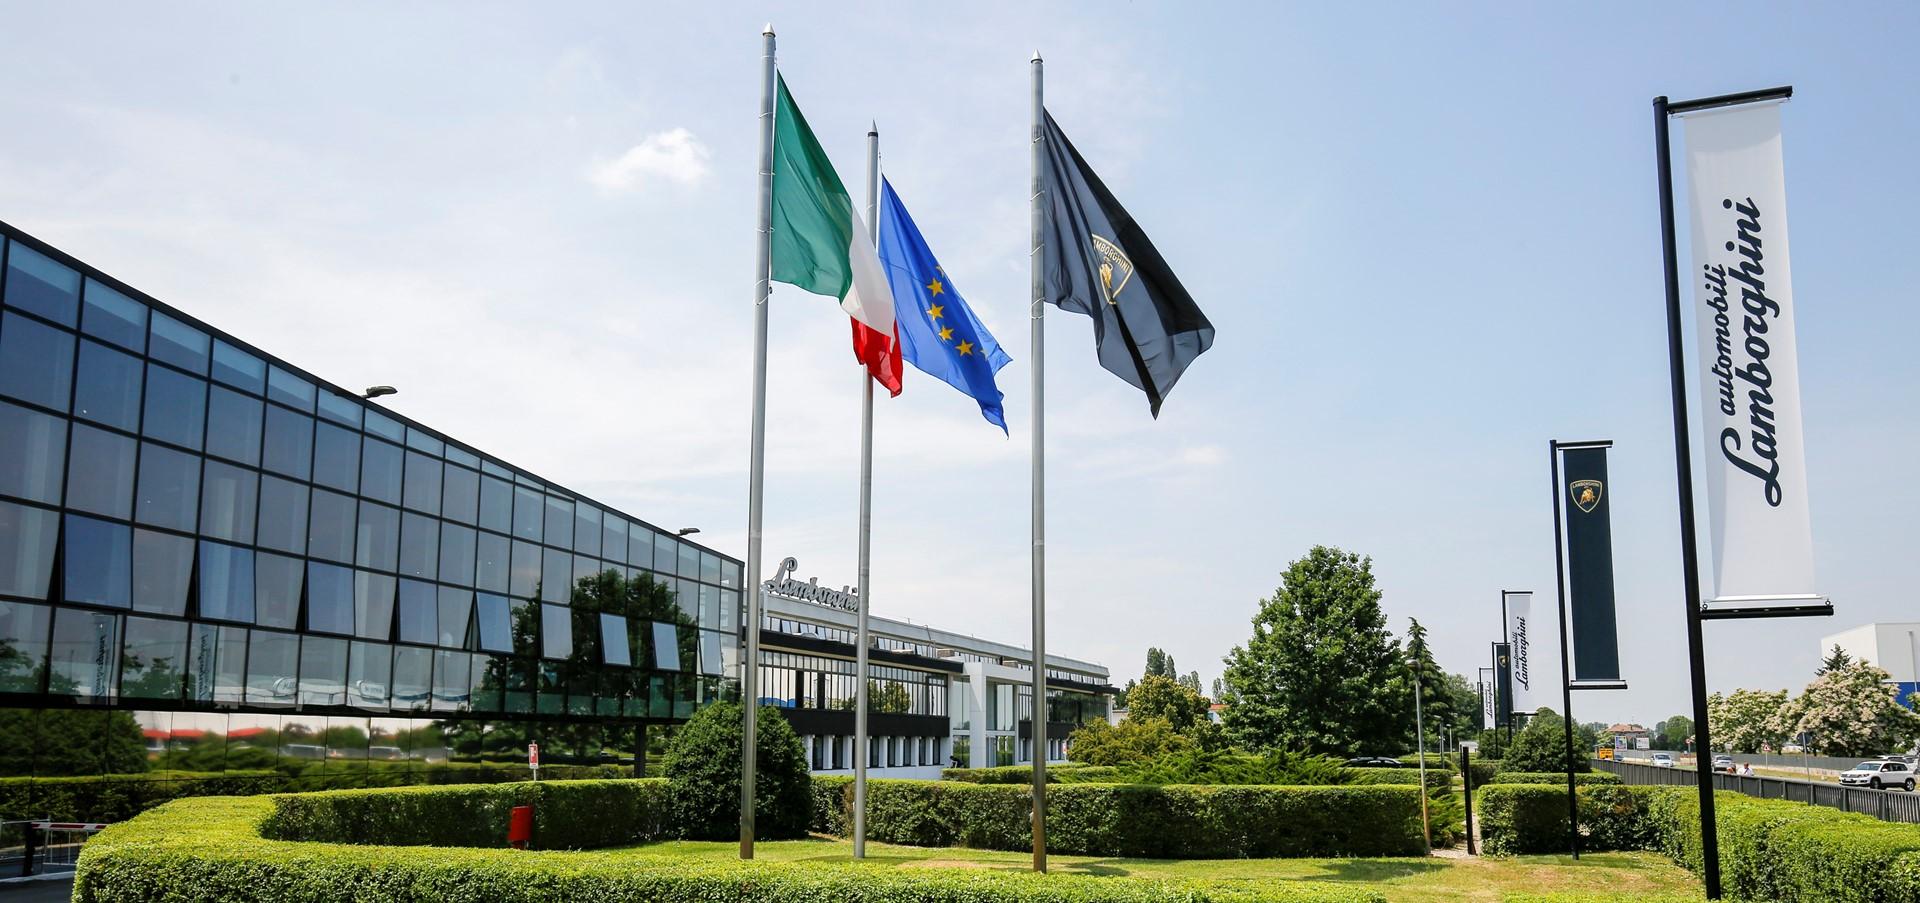 Automobili Lamborghini prepares to restart production on May